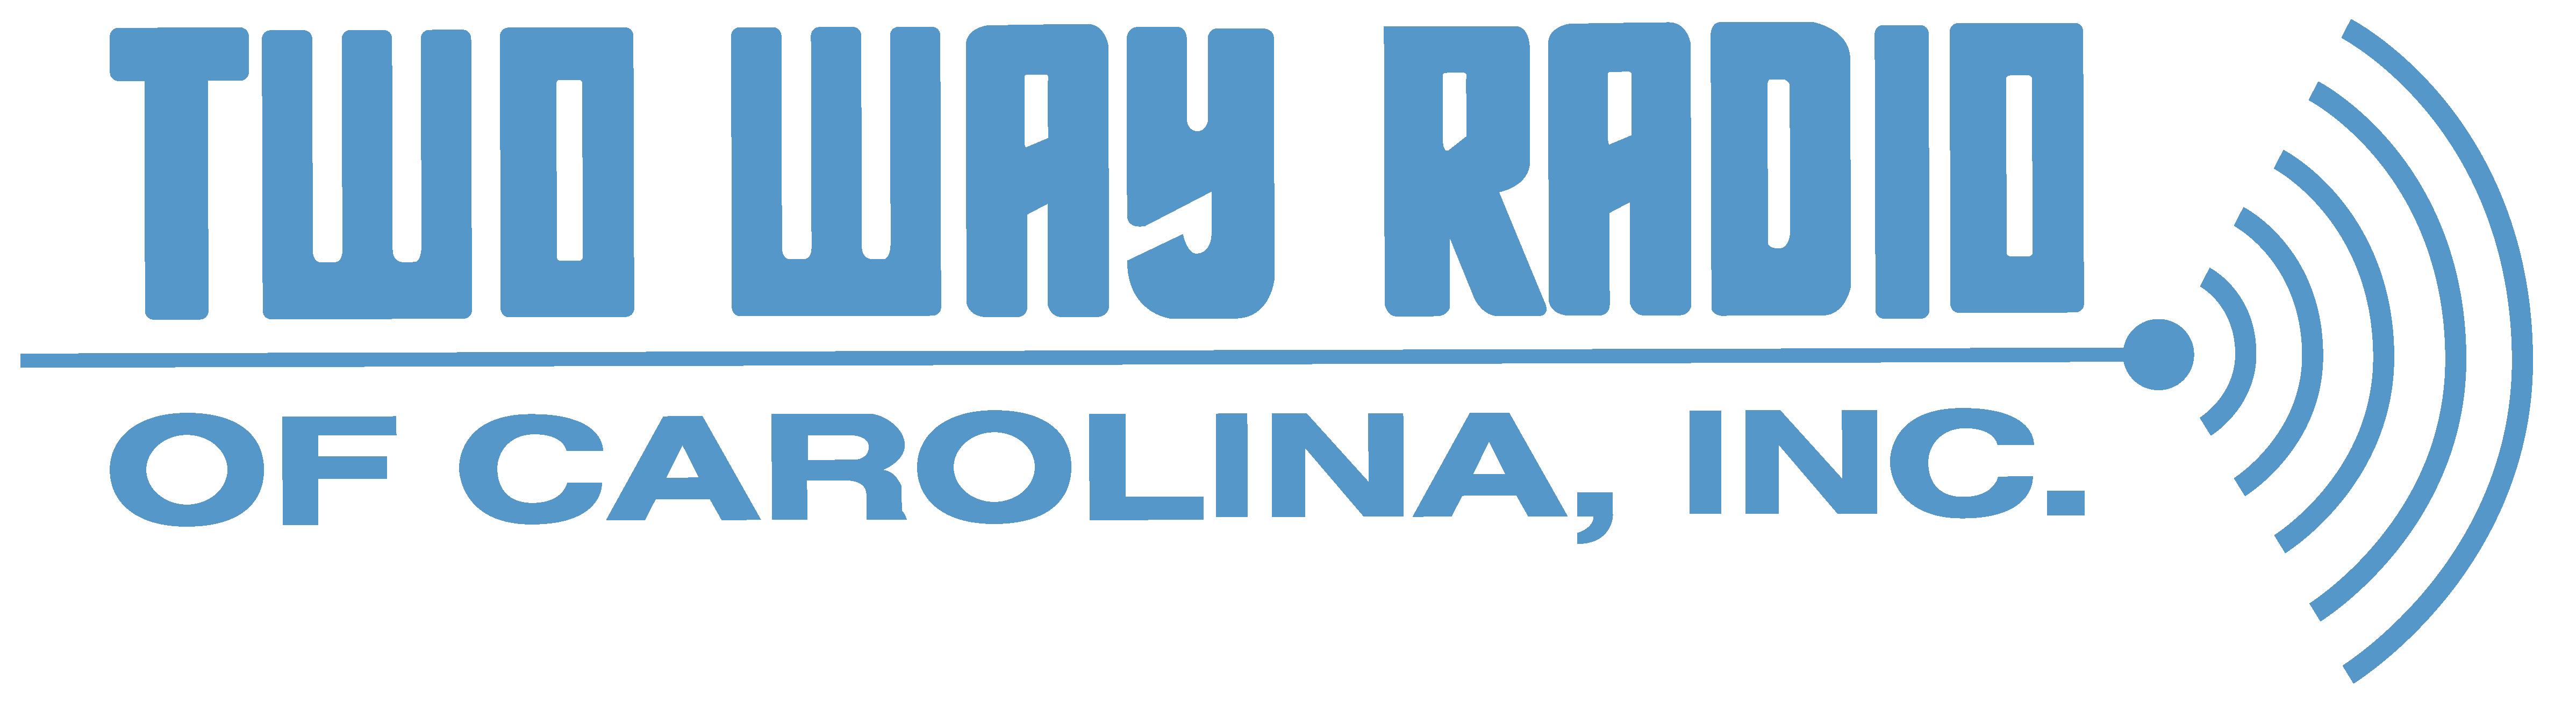 Two Way Radio of Carolina